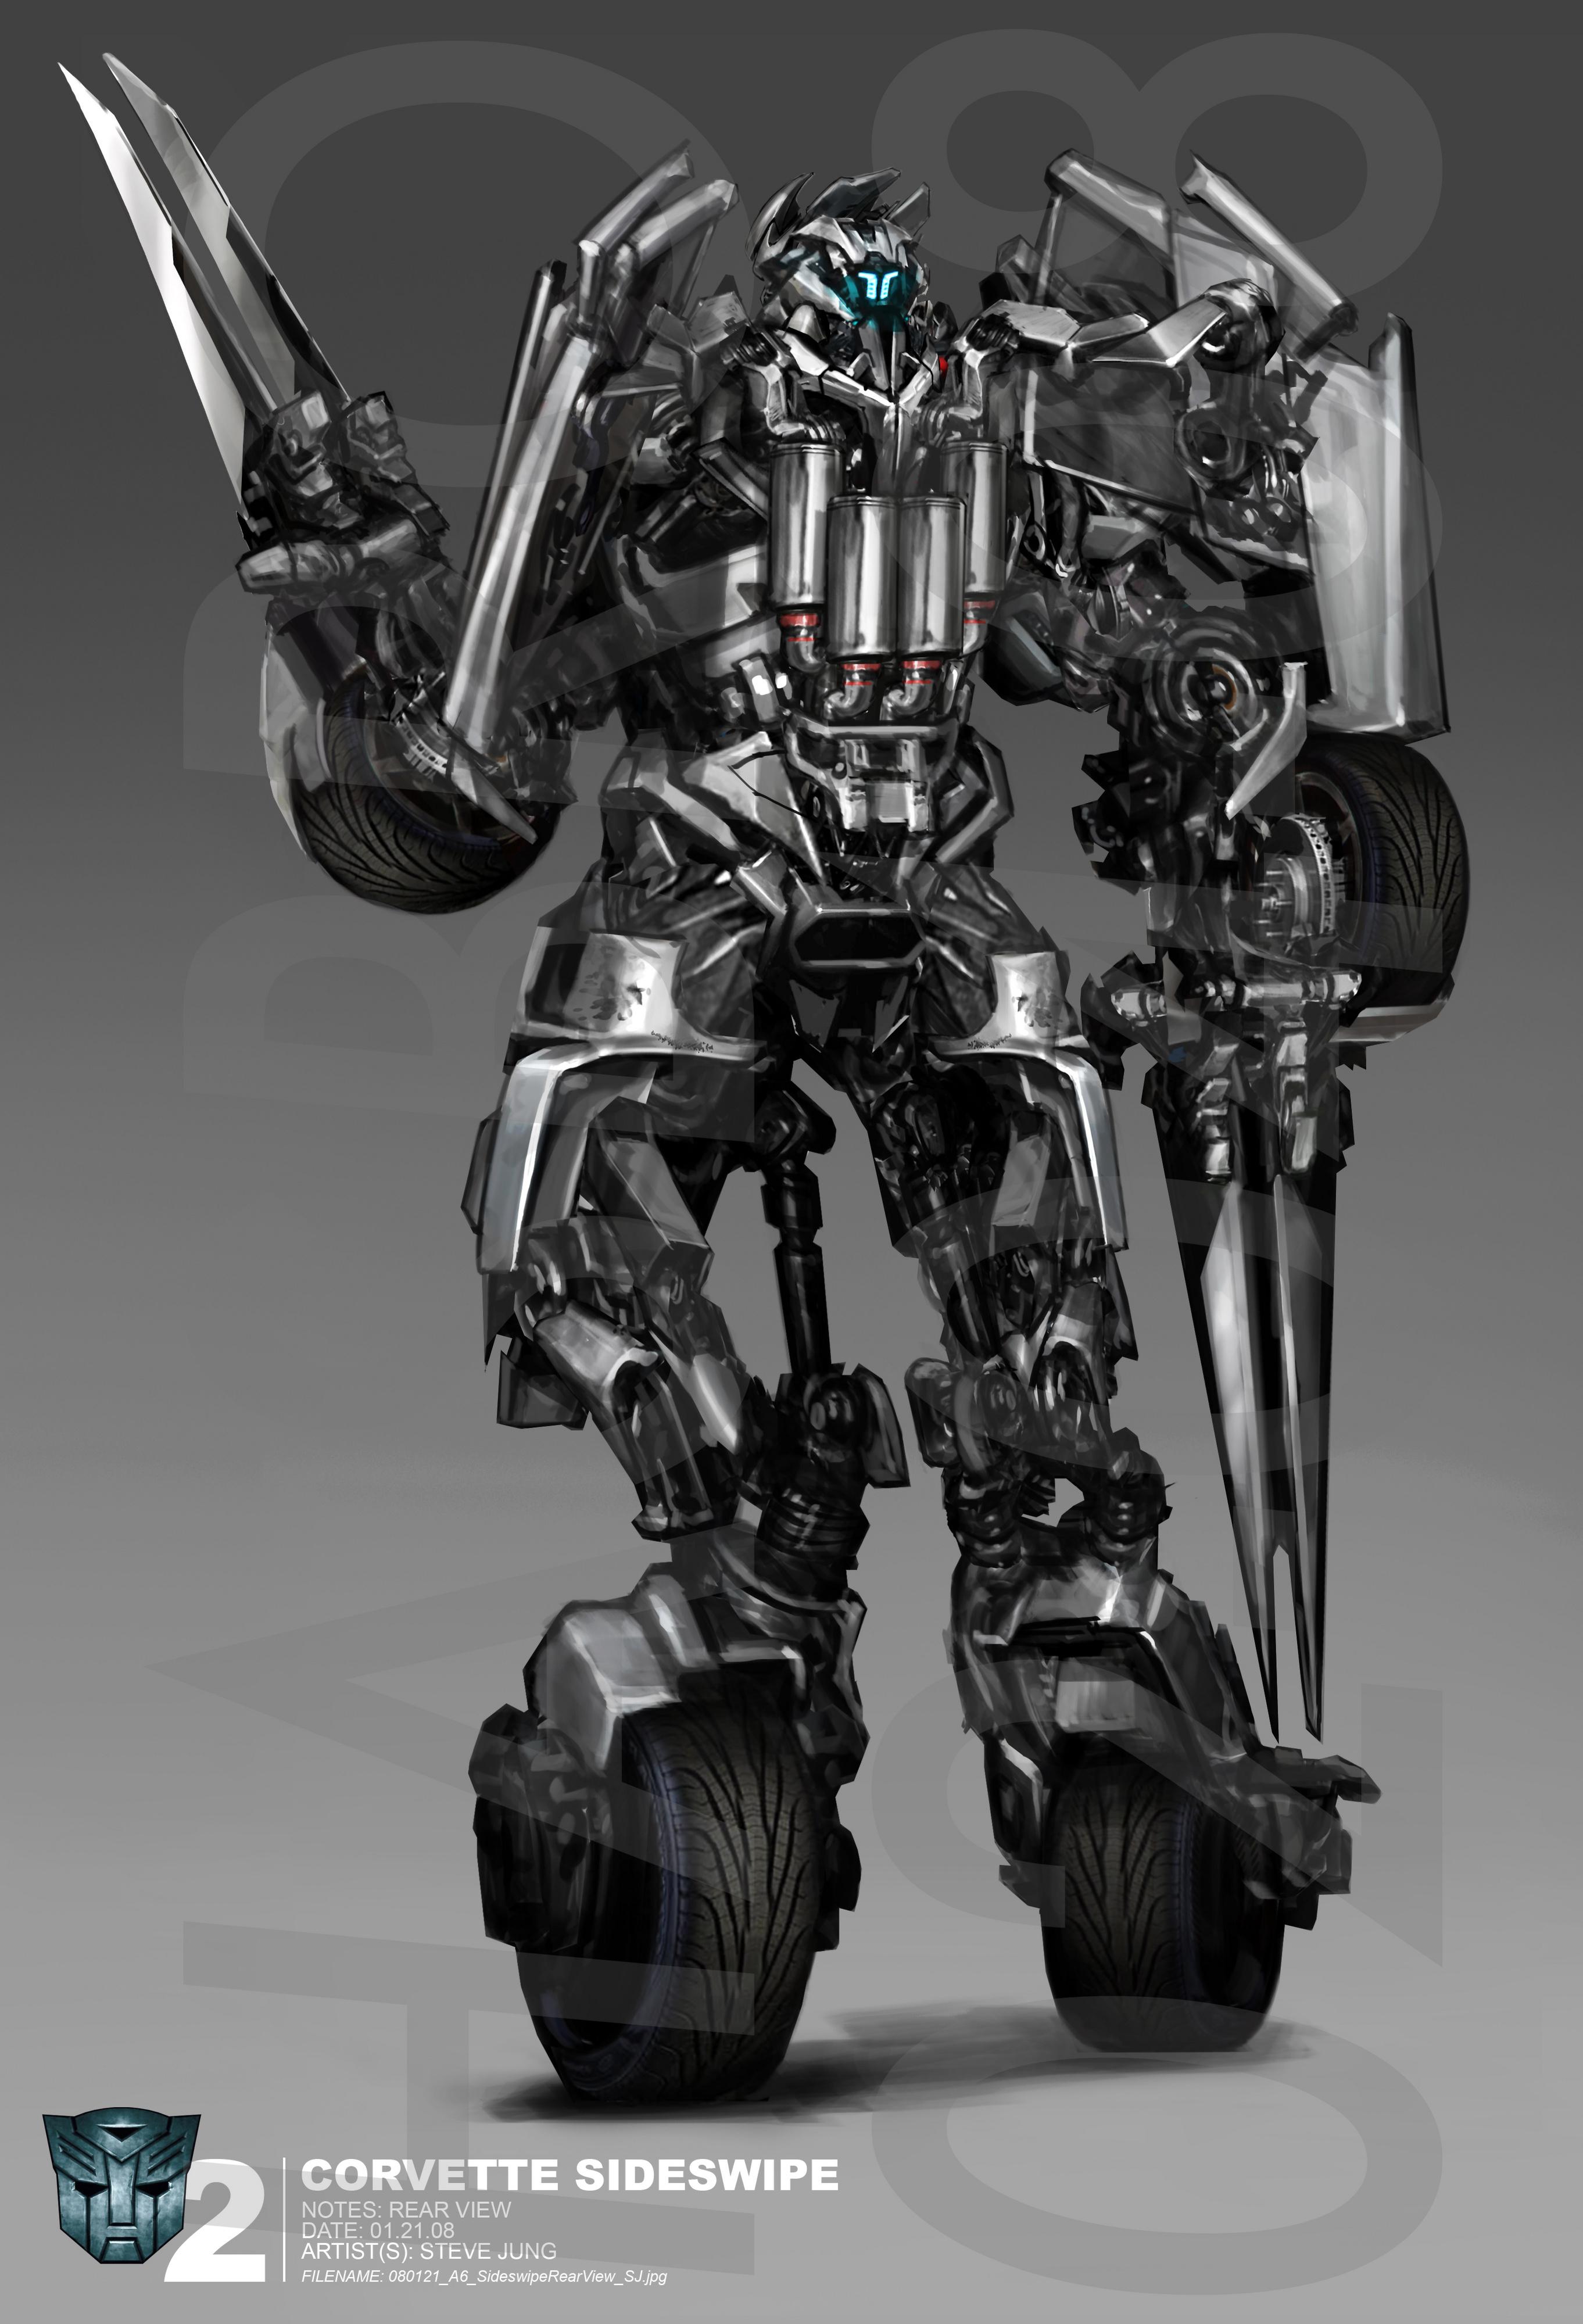 Revenge of the Fallen Sideswipe Concept Art - Transformers